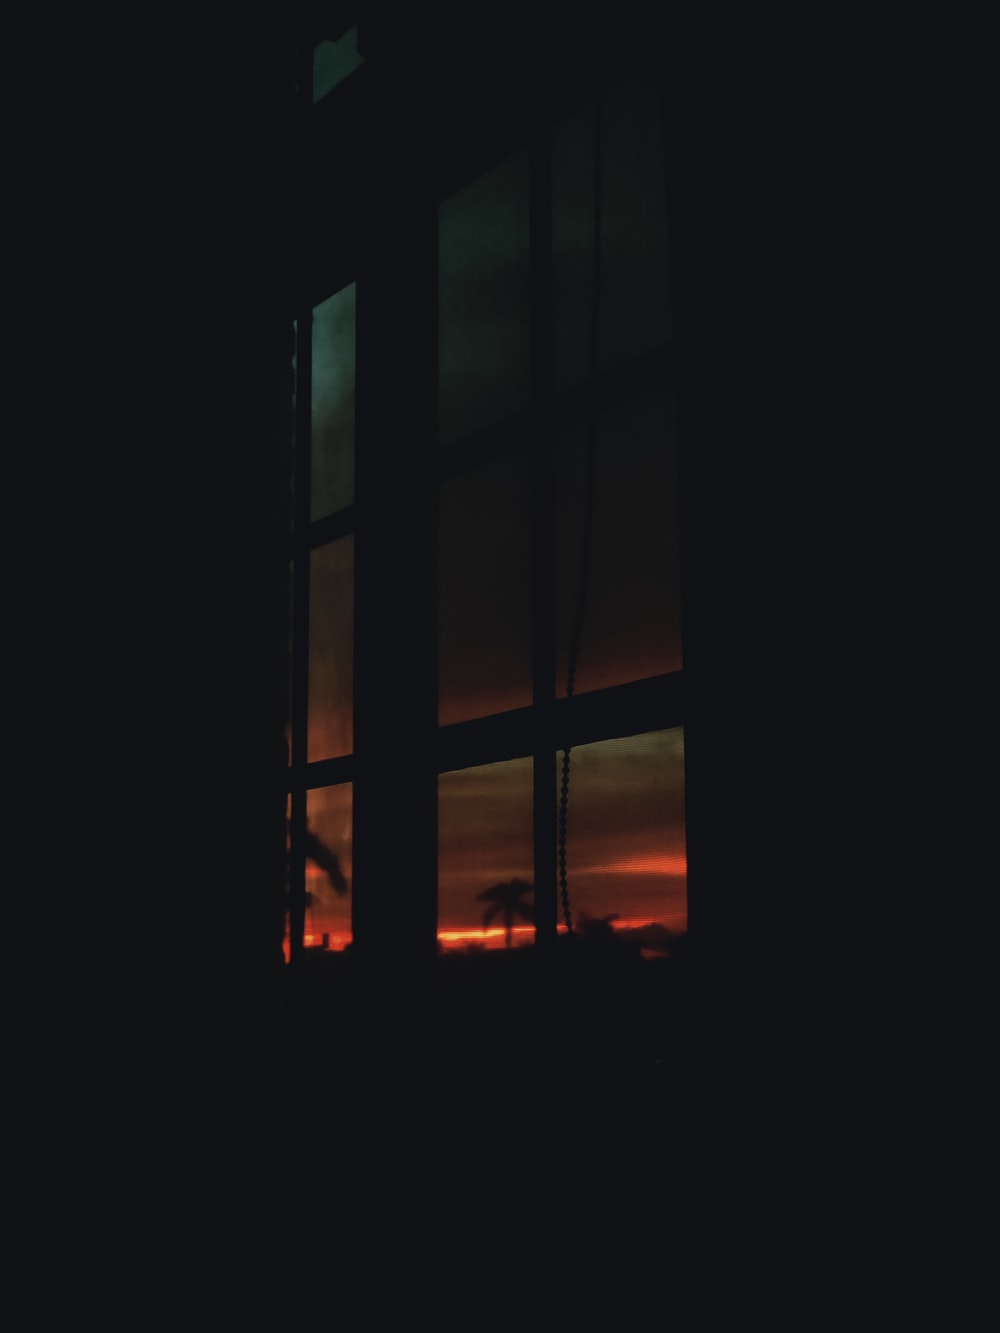 brown wooden glass window